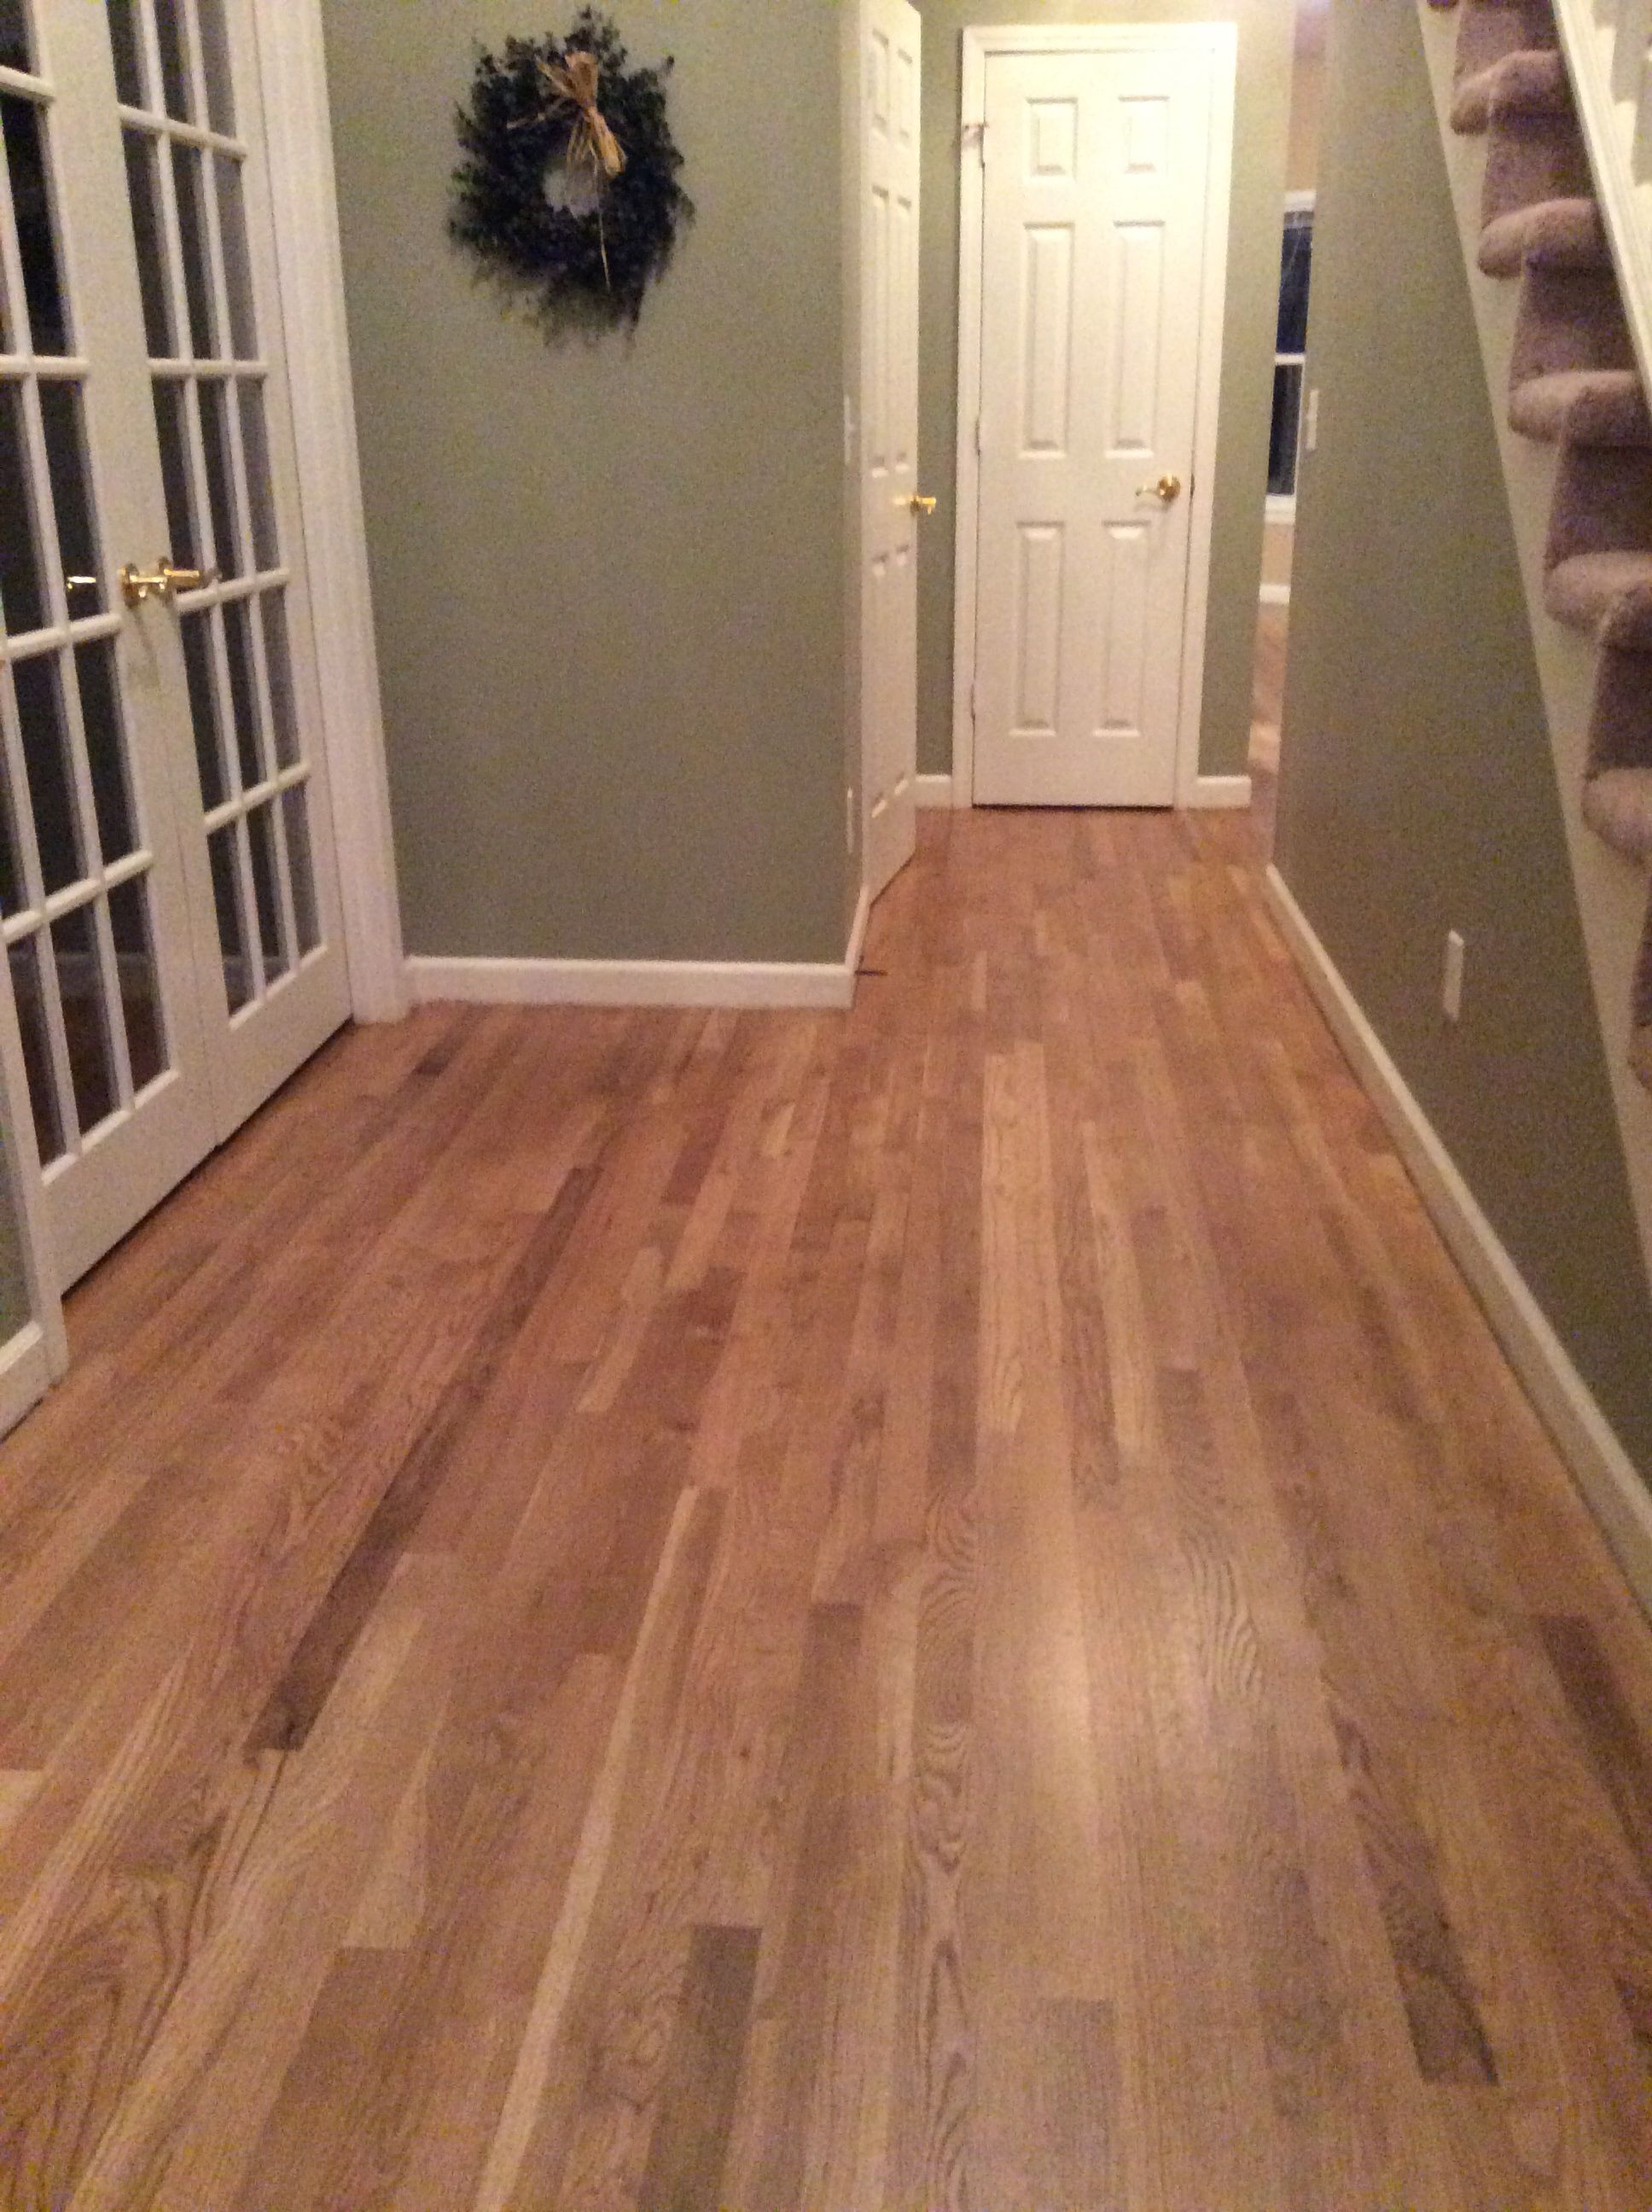 New Hardwood Floors Select White Oak With Golden Stain